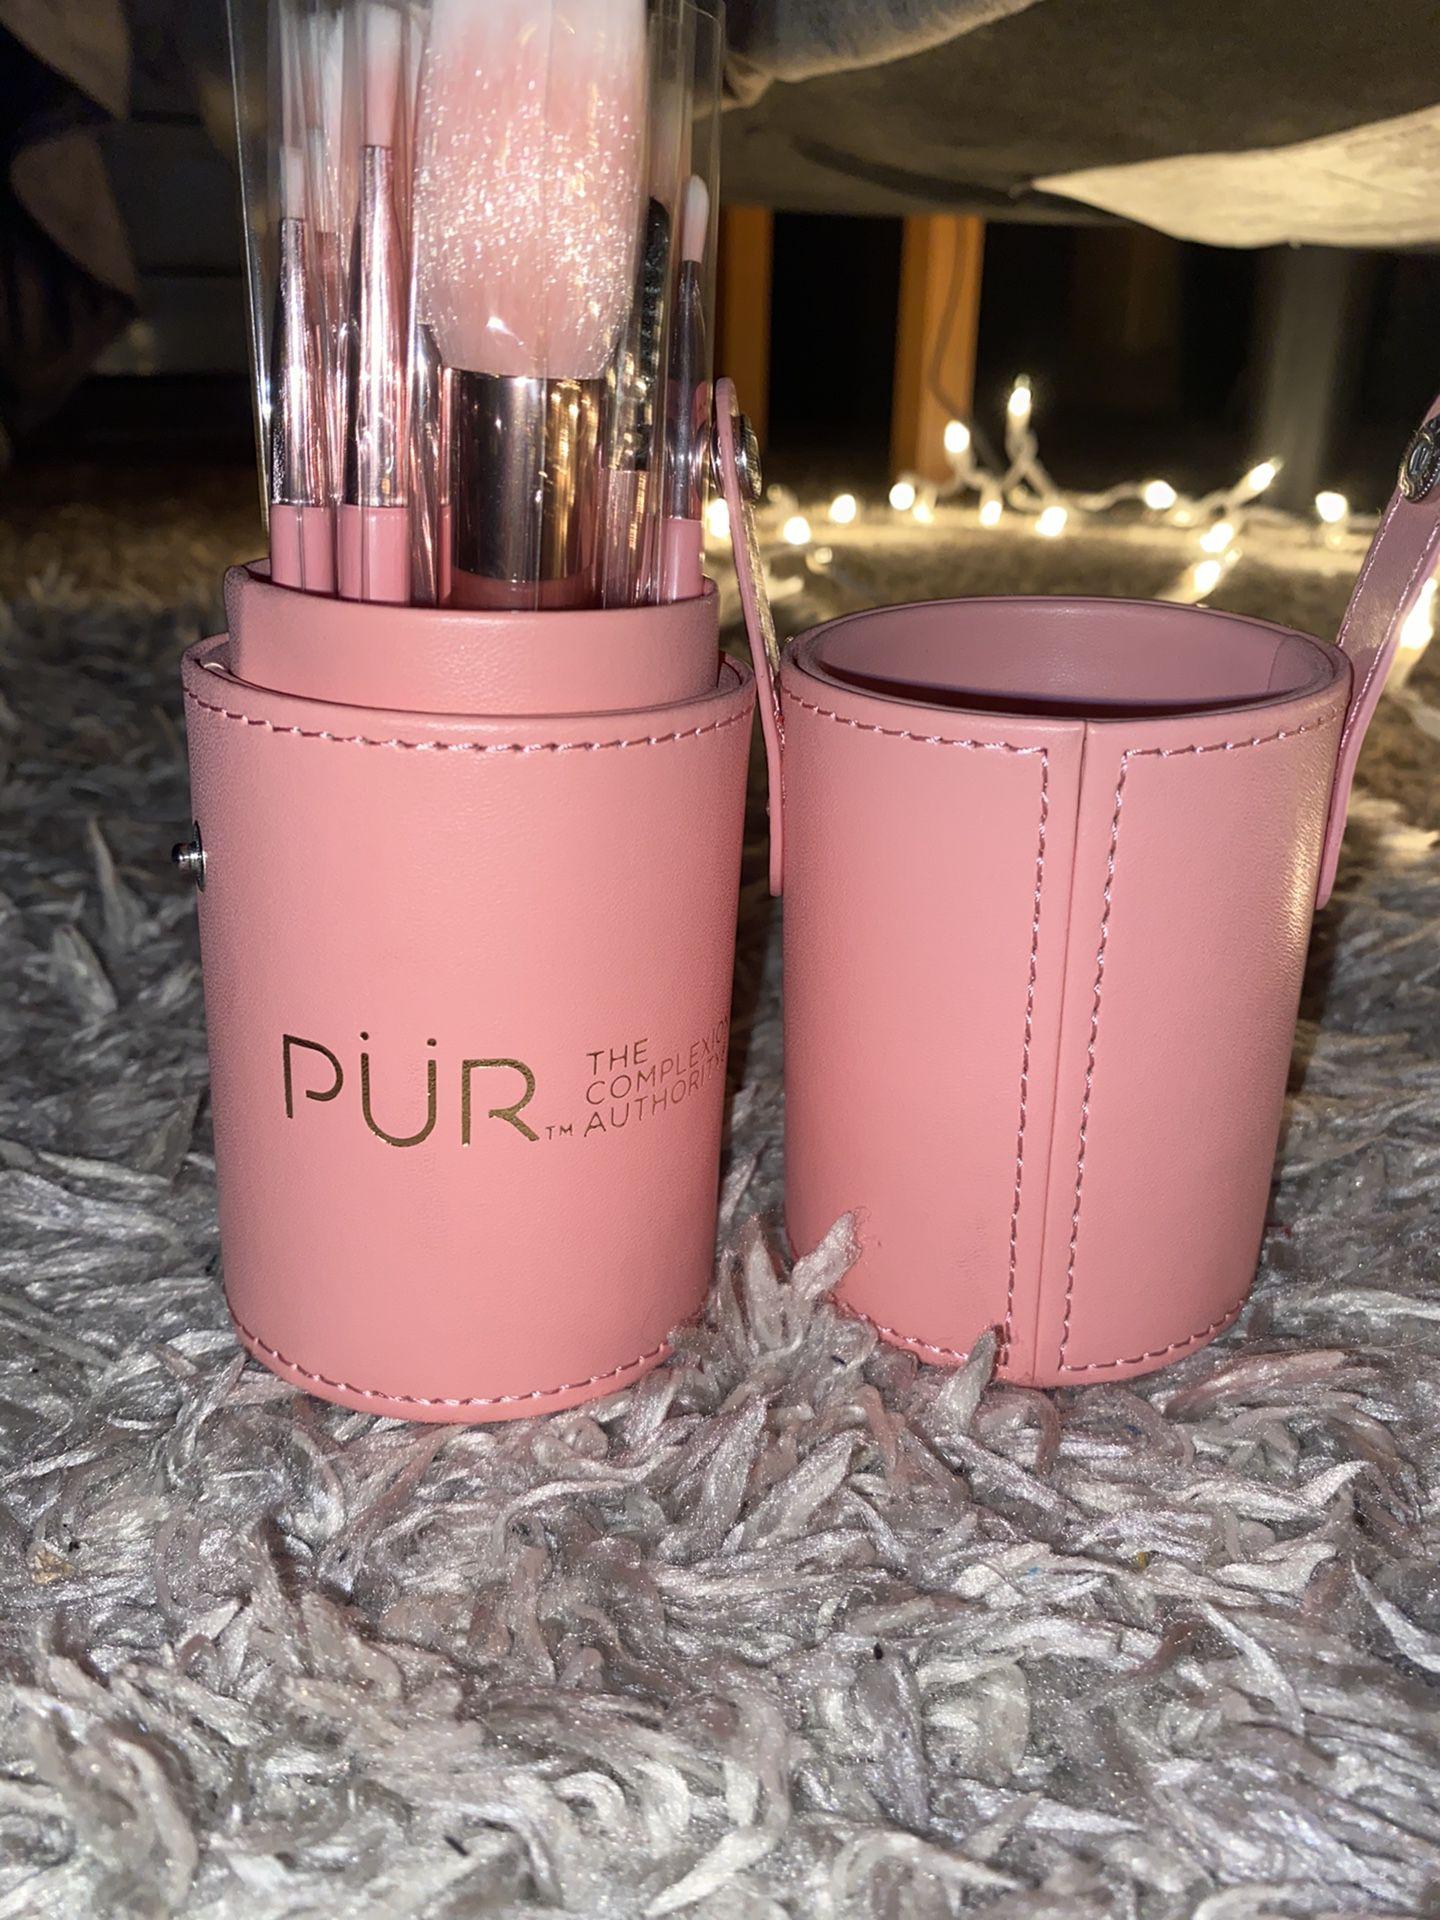 Pür cosmetic brushes